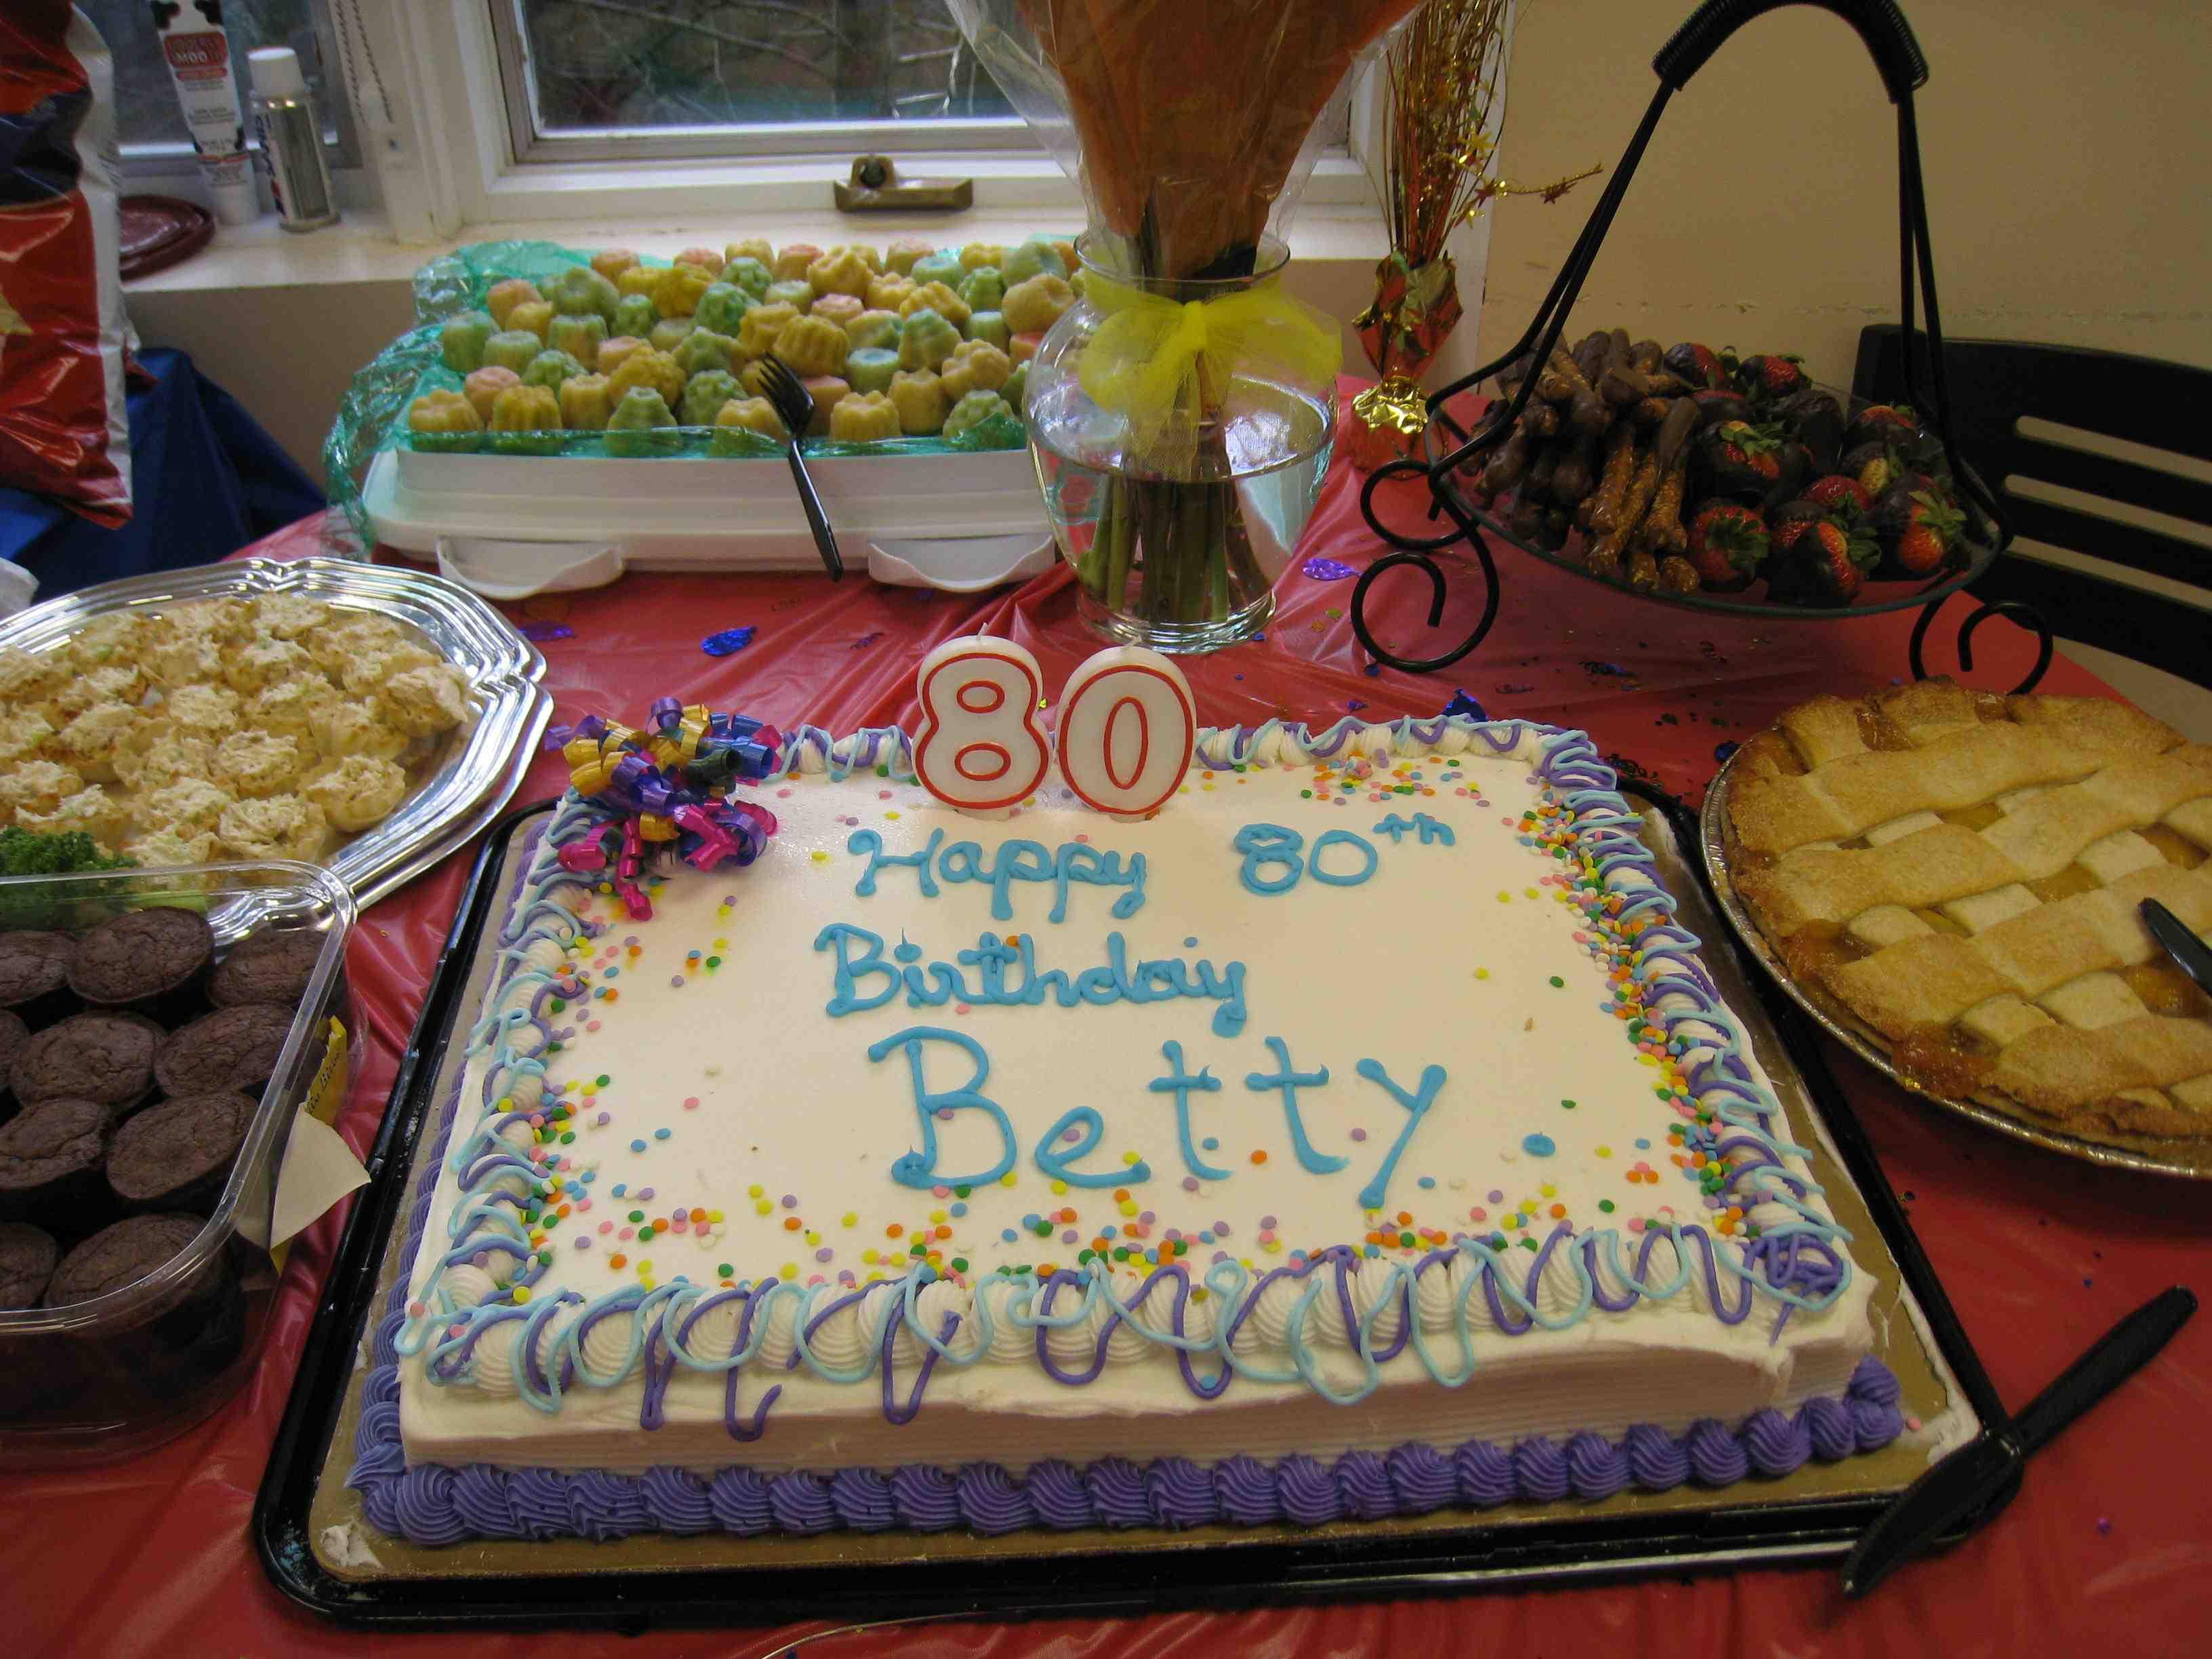 Happy Birthday Betty